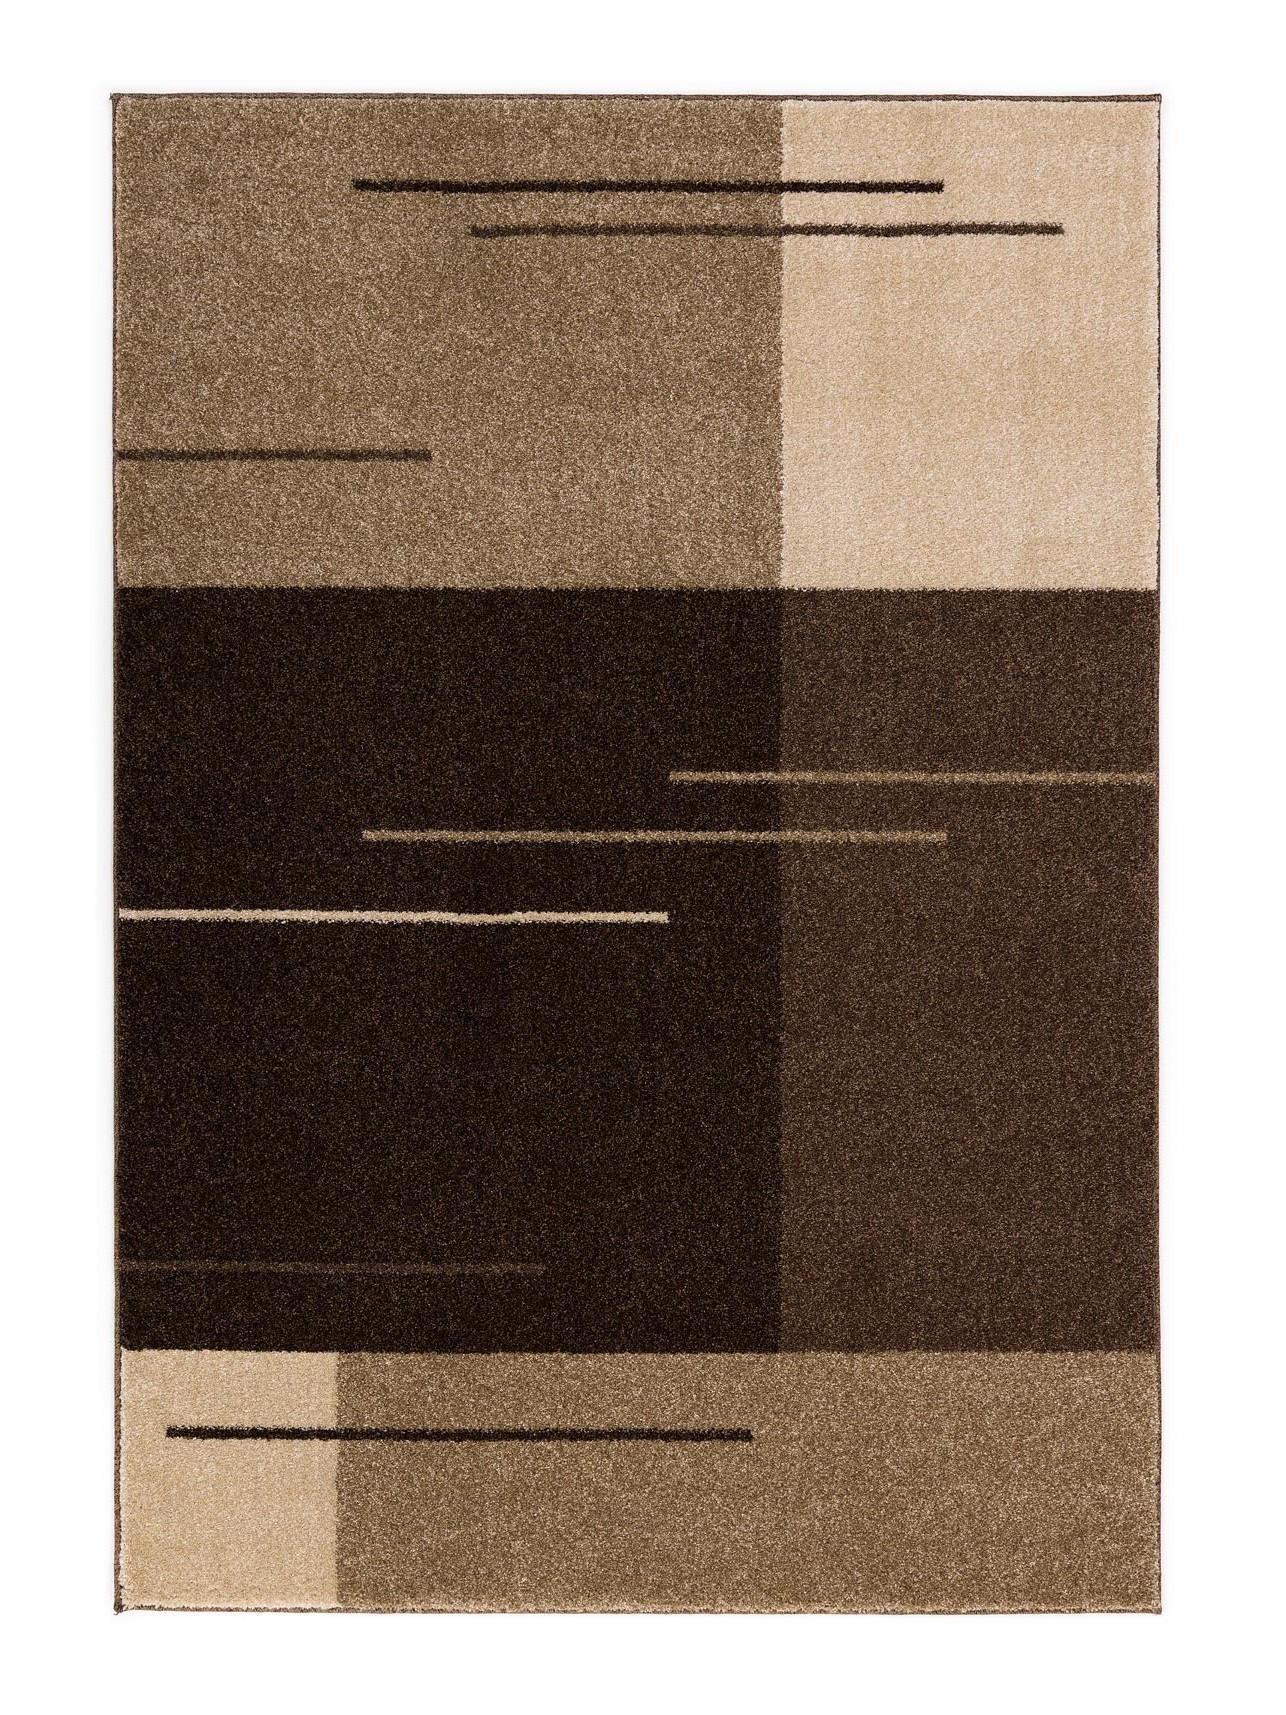 TKANA PREPROGA SAMOA, RJAVA - rjava, Design, tekstil (130/67cm) - BOXXX